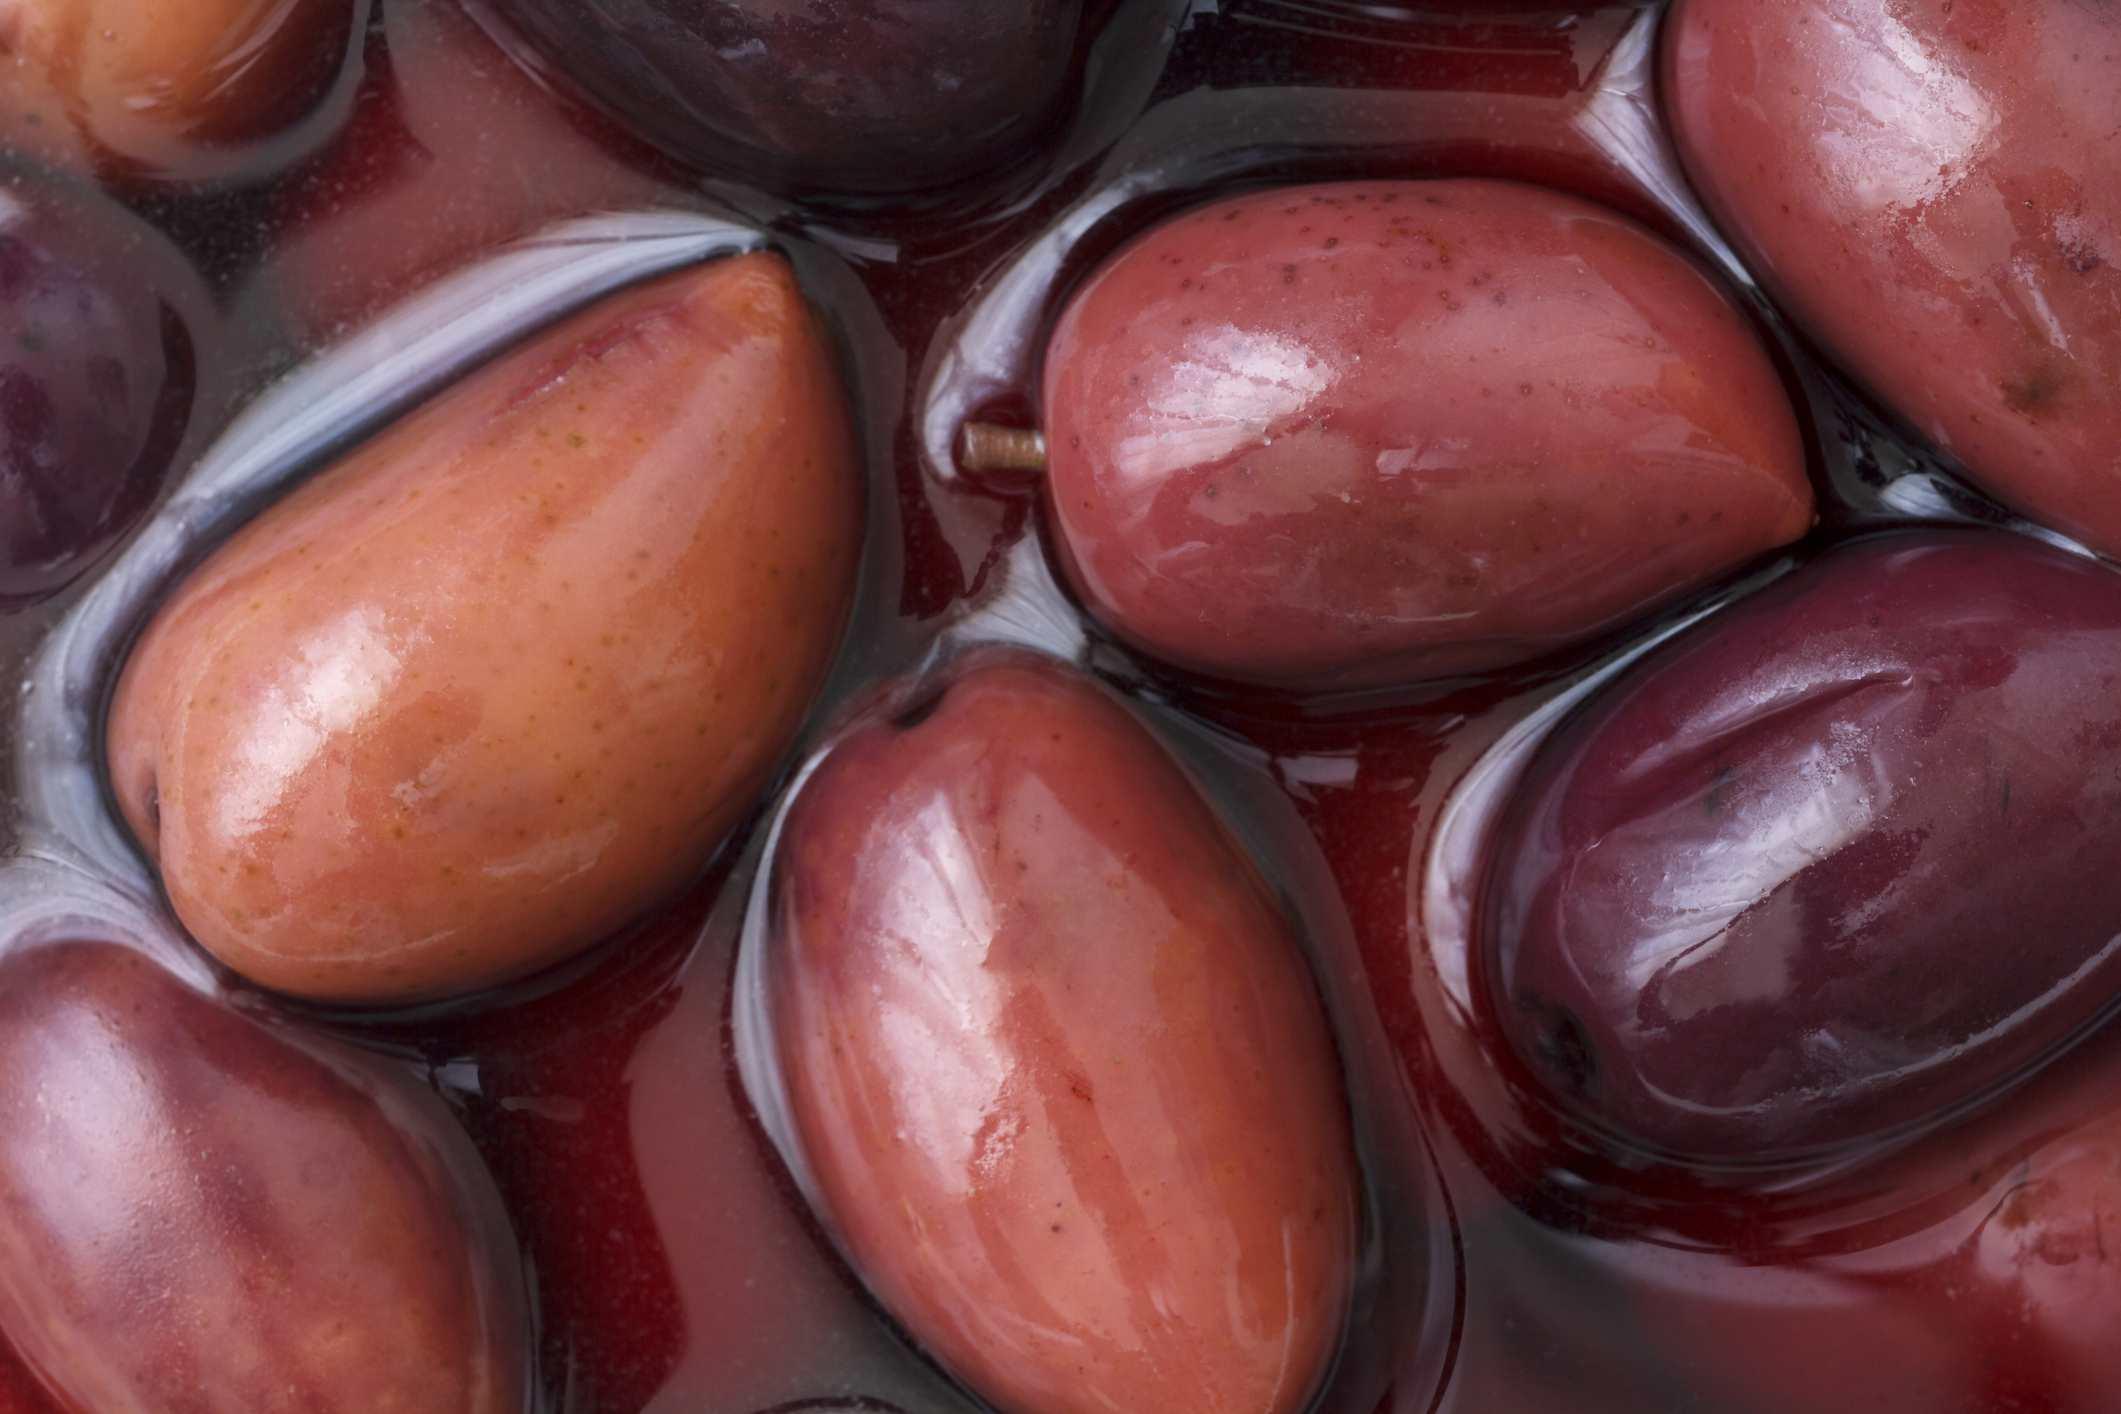 Brown Kalamata olives in liquid